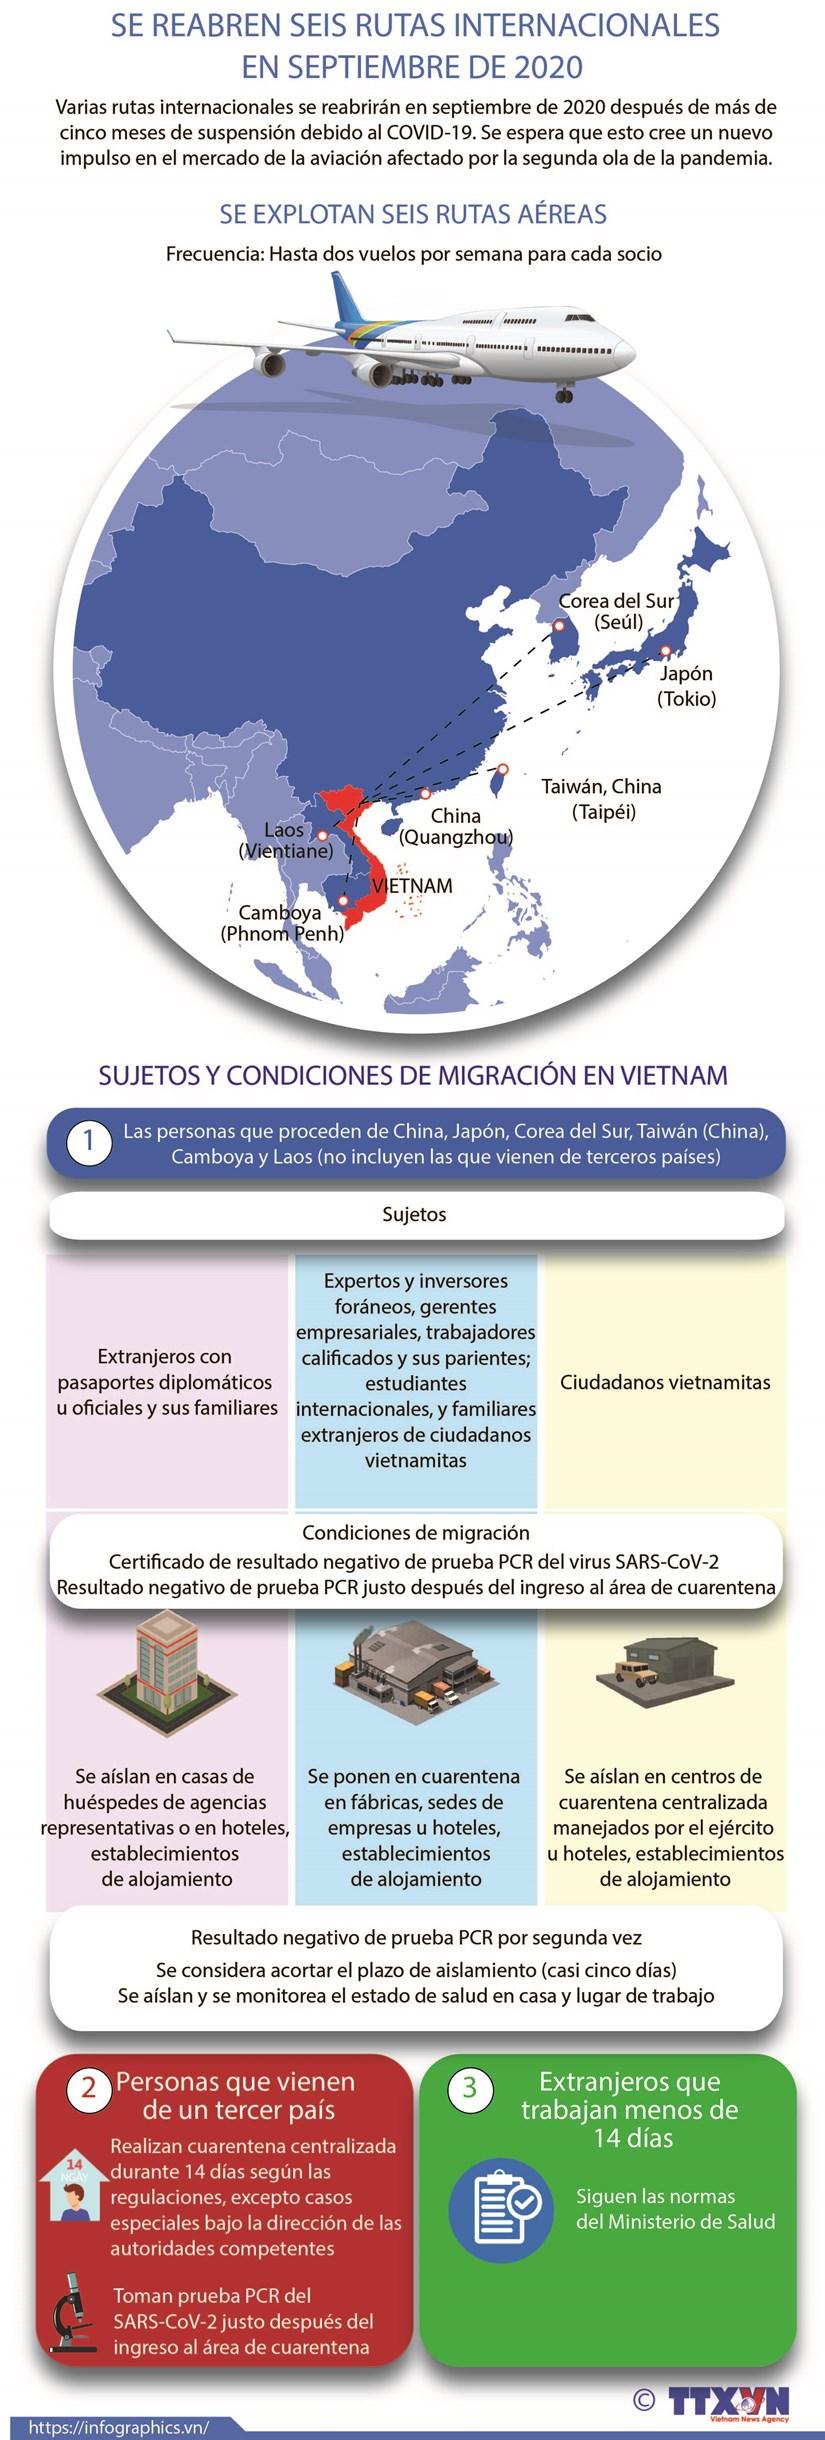 [Info] Se reabren seis rutas internacionales en septiembre de 2020 hinh anh 1